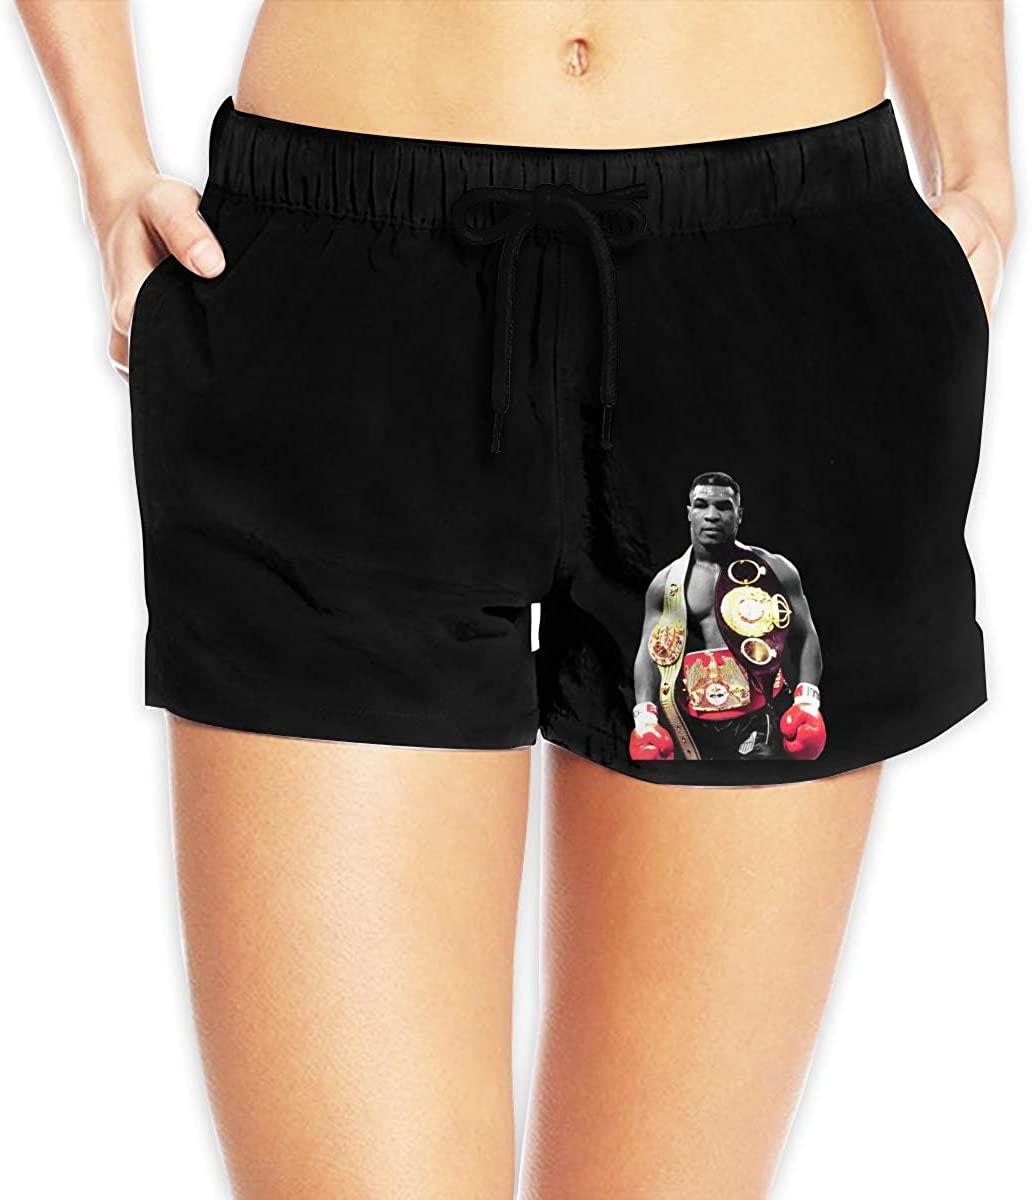 Hangquq Ladiesmike Tyson Printed Bouquet with Waist Beach Shorts.